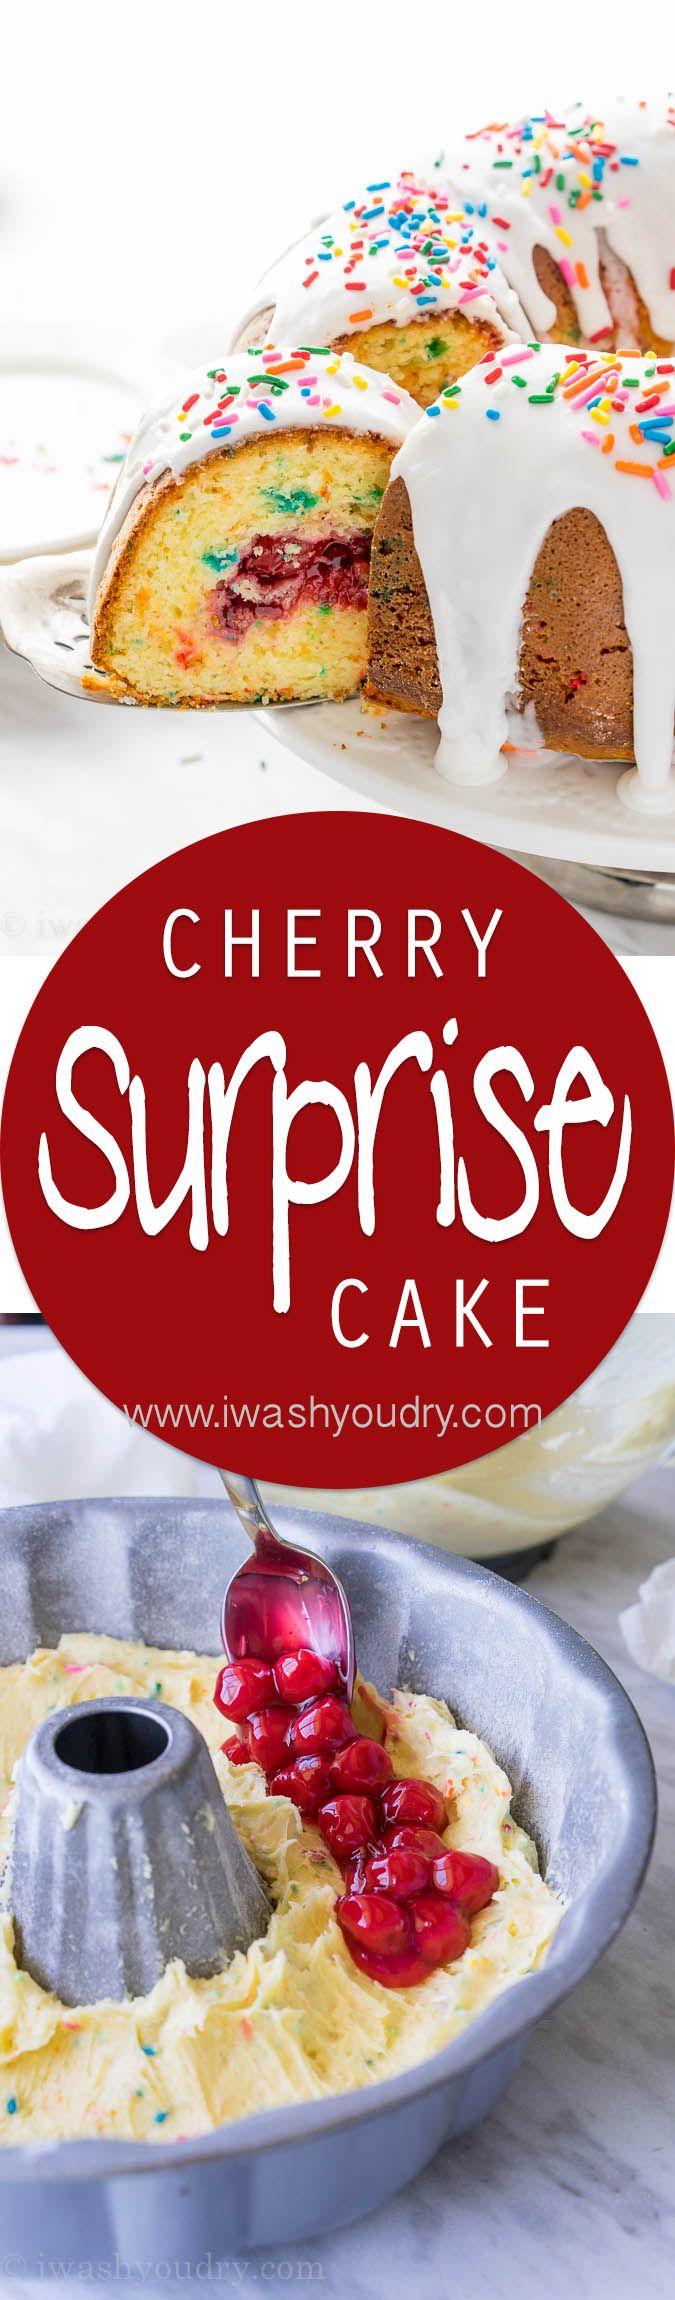 Cherry Surprise Cake